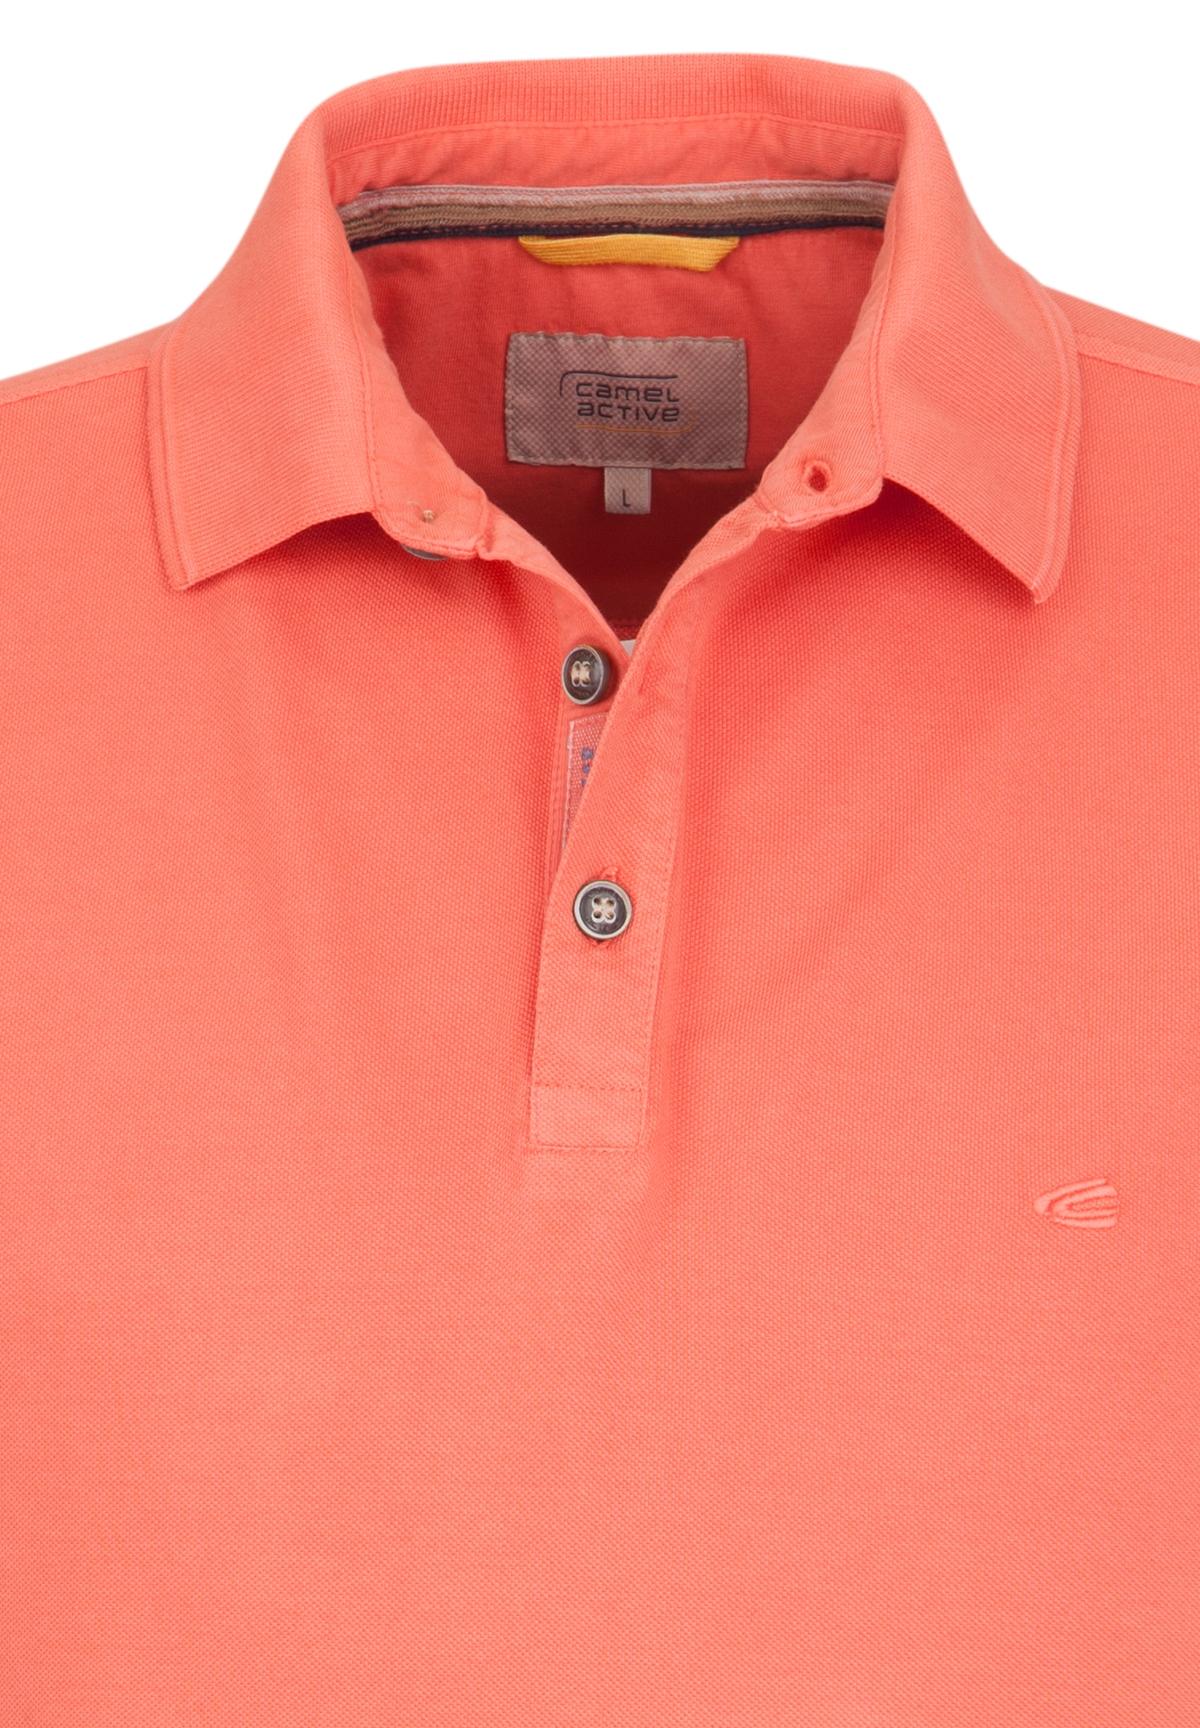 Camel-Active-Herren-Shirt-Poloshirt-Pique-Regular-Fit-NEU Indexbild 65